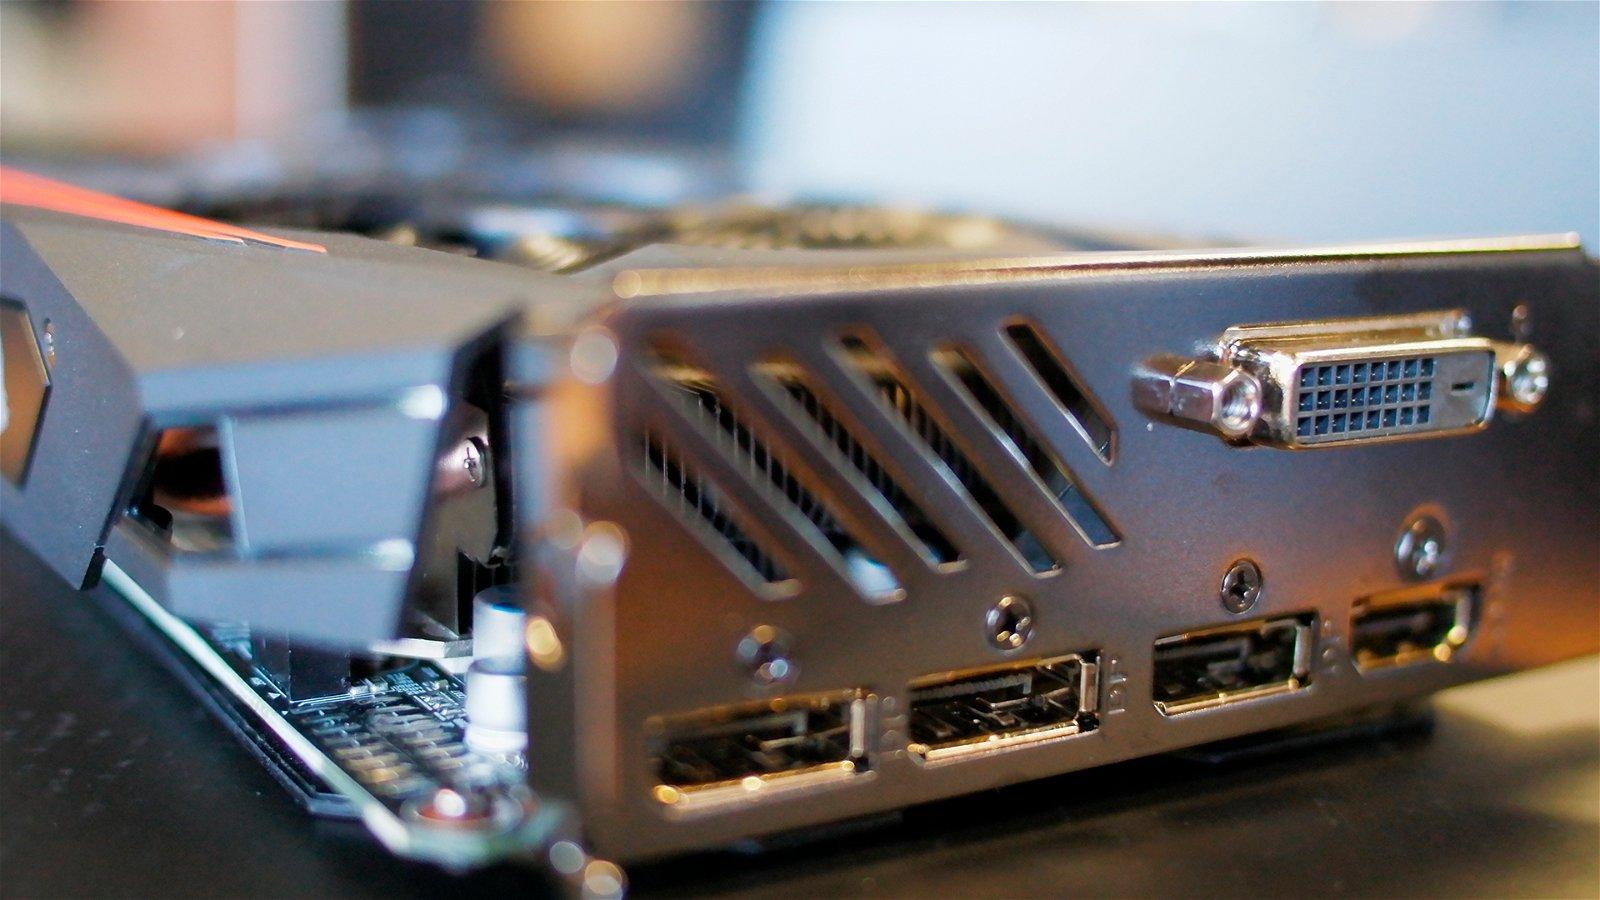 AMD Radeon RX 570 GPU (Hardware) Review – A Familiar Refresh 3